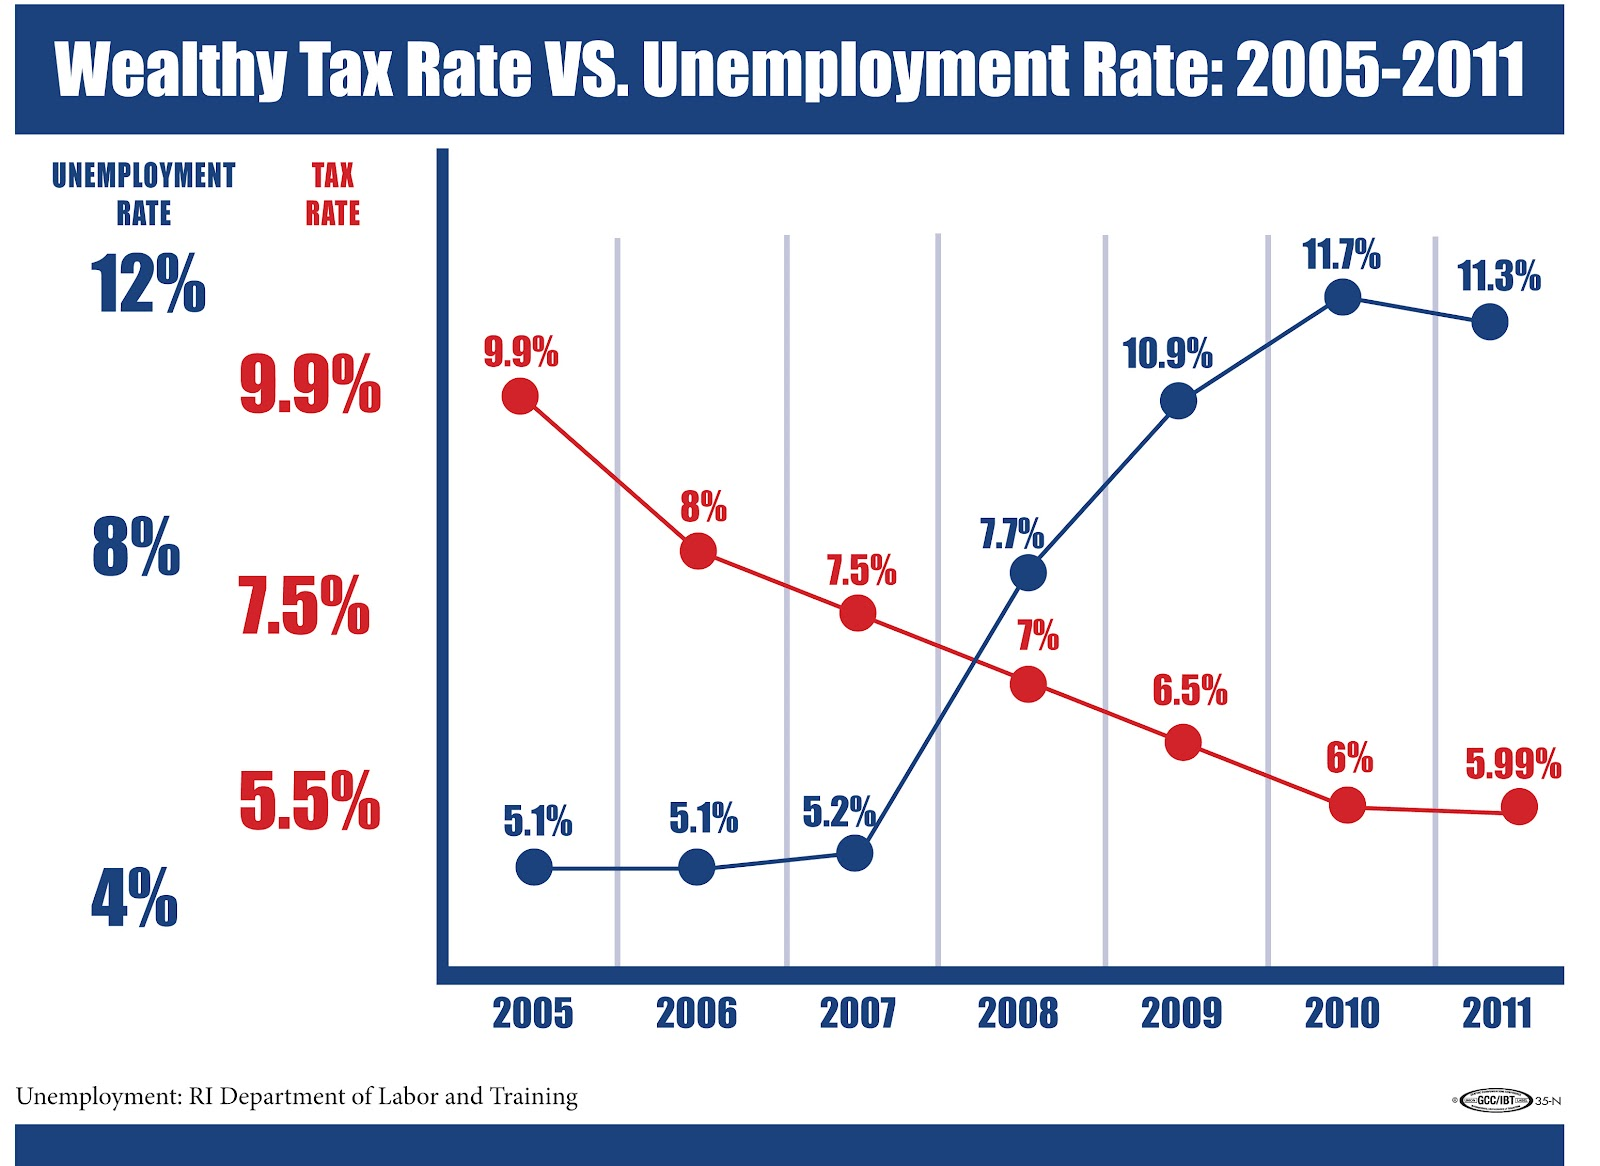 Rhode Island Capital Gains Tax Rate